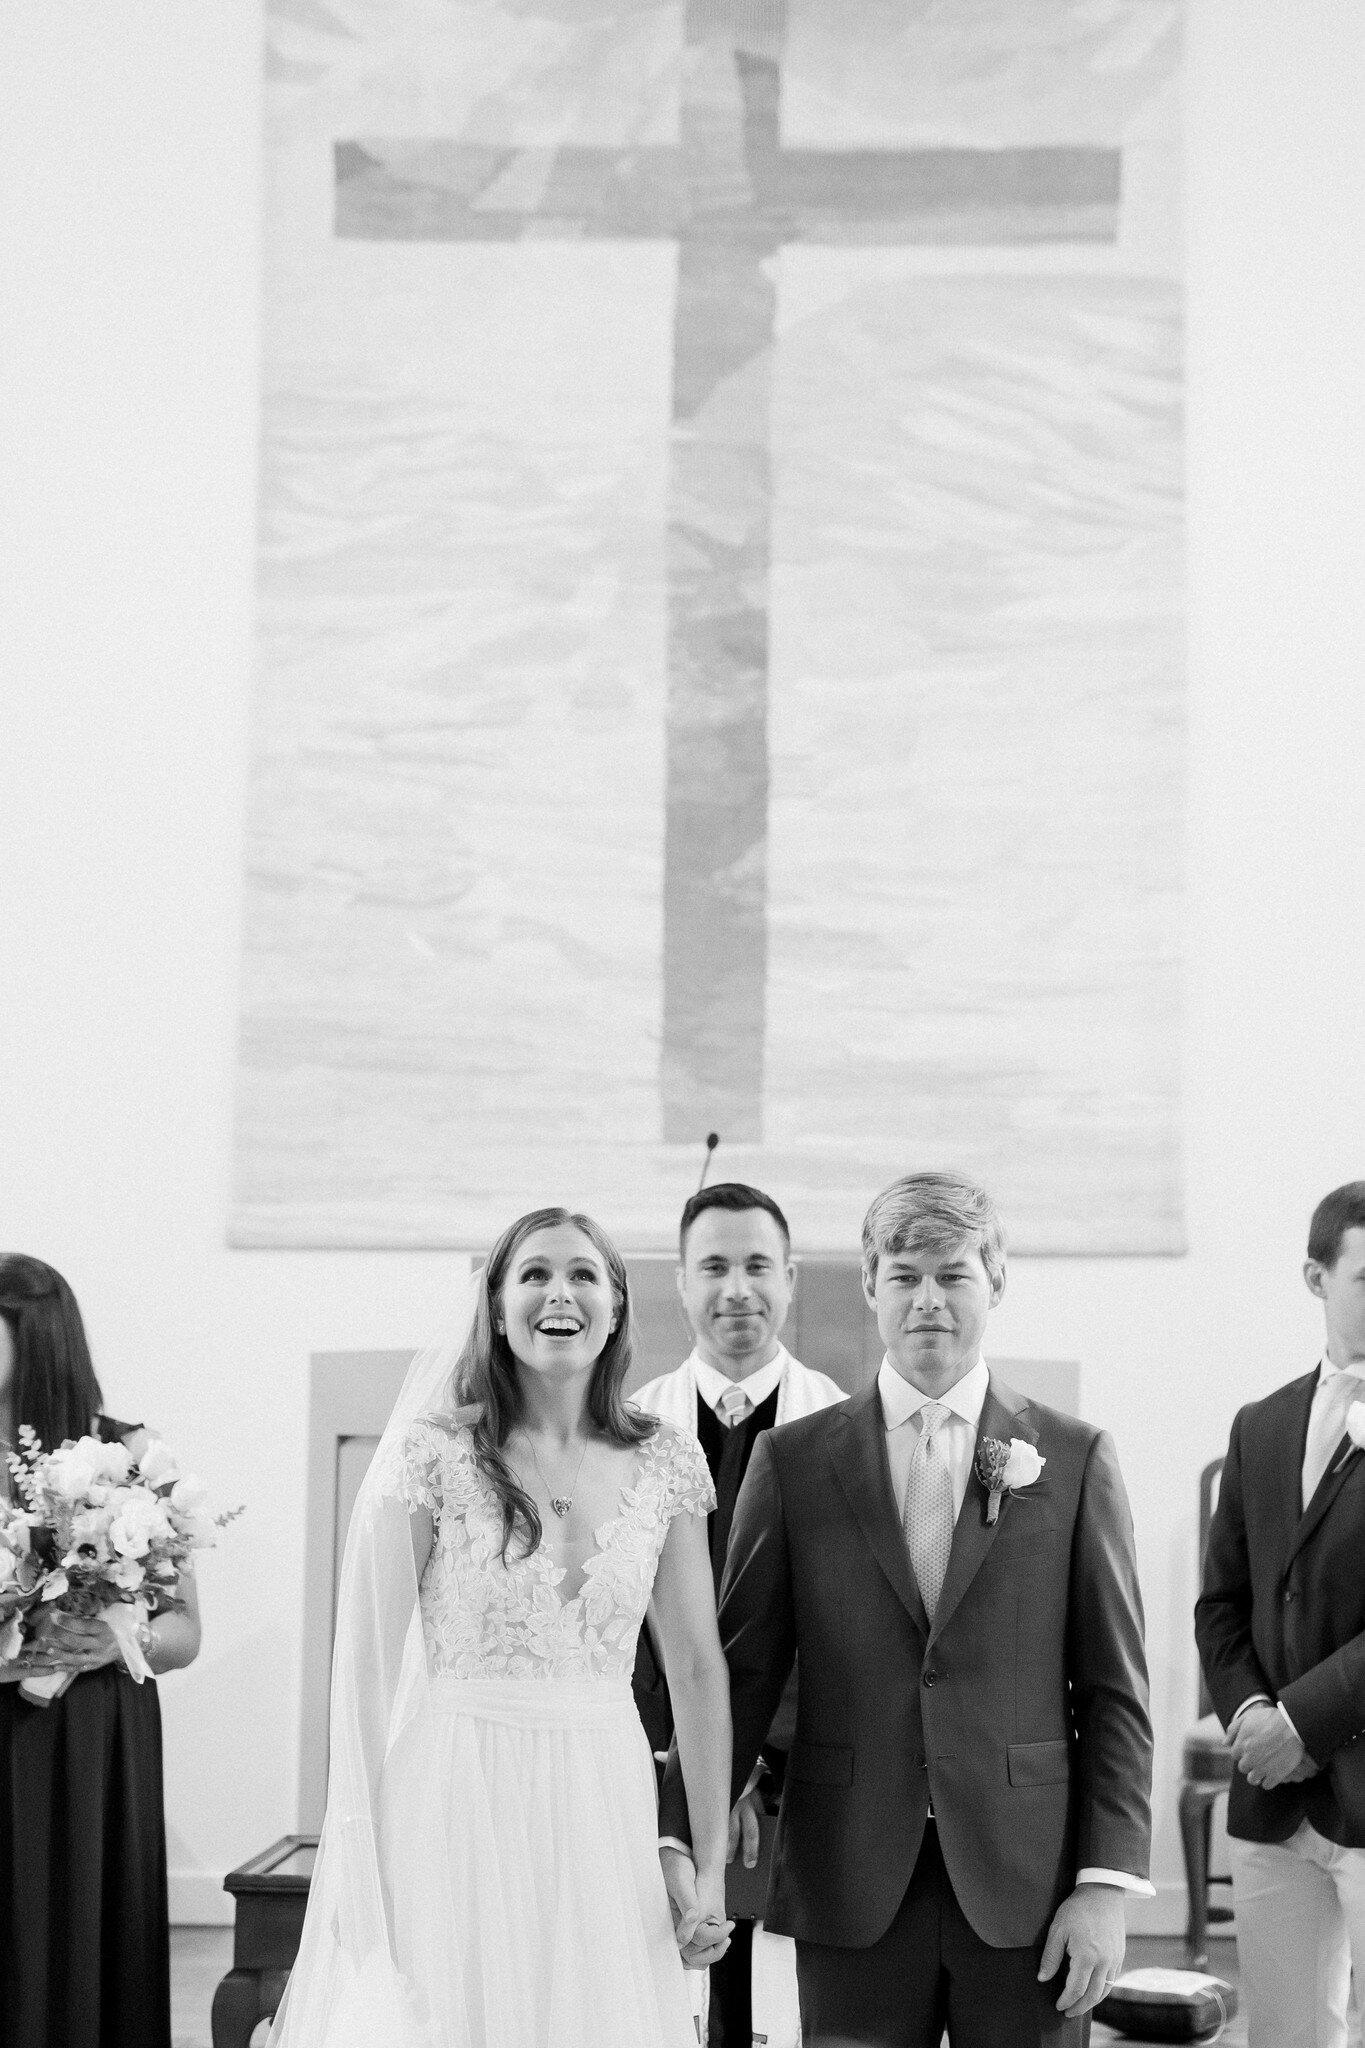 greenwich wedding_belle haven club wedding _ct wedding photographer-23_Easy-Resize.com.jpg